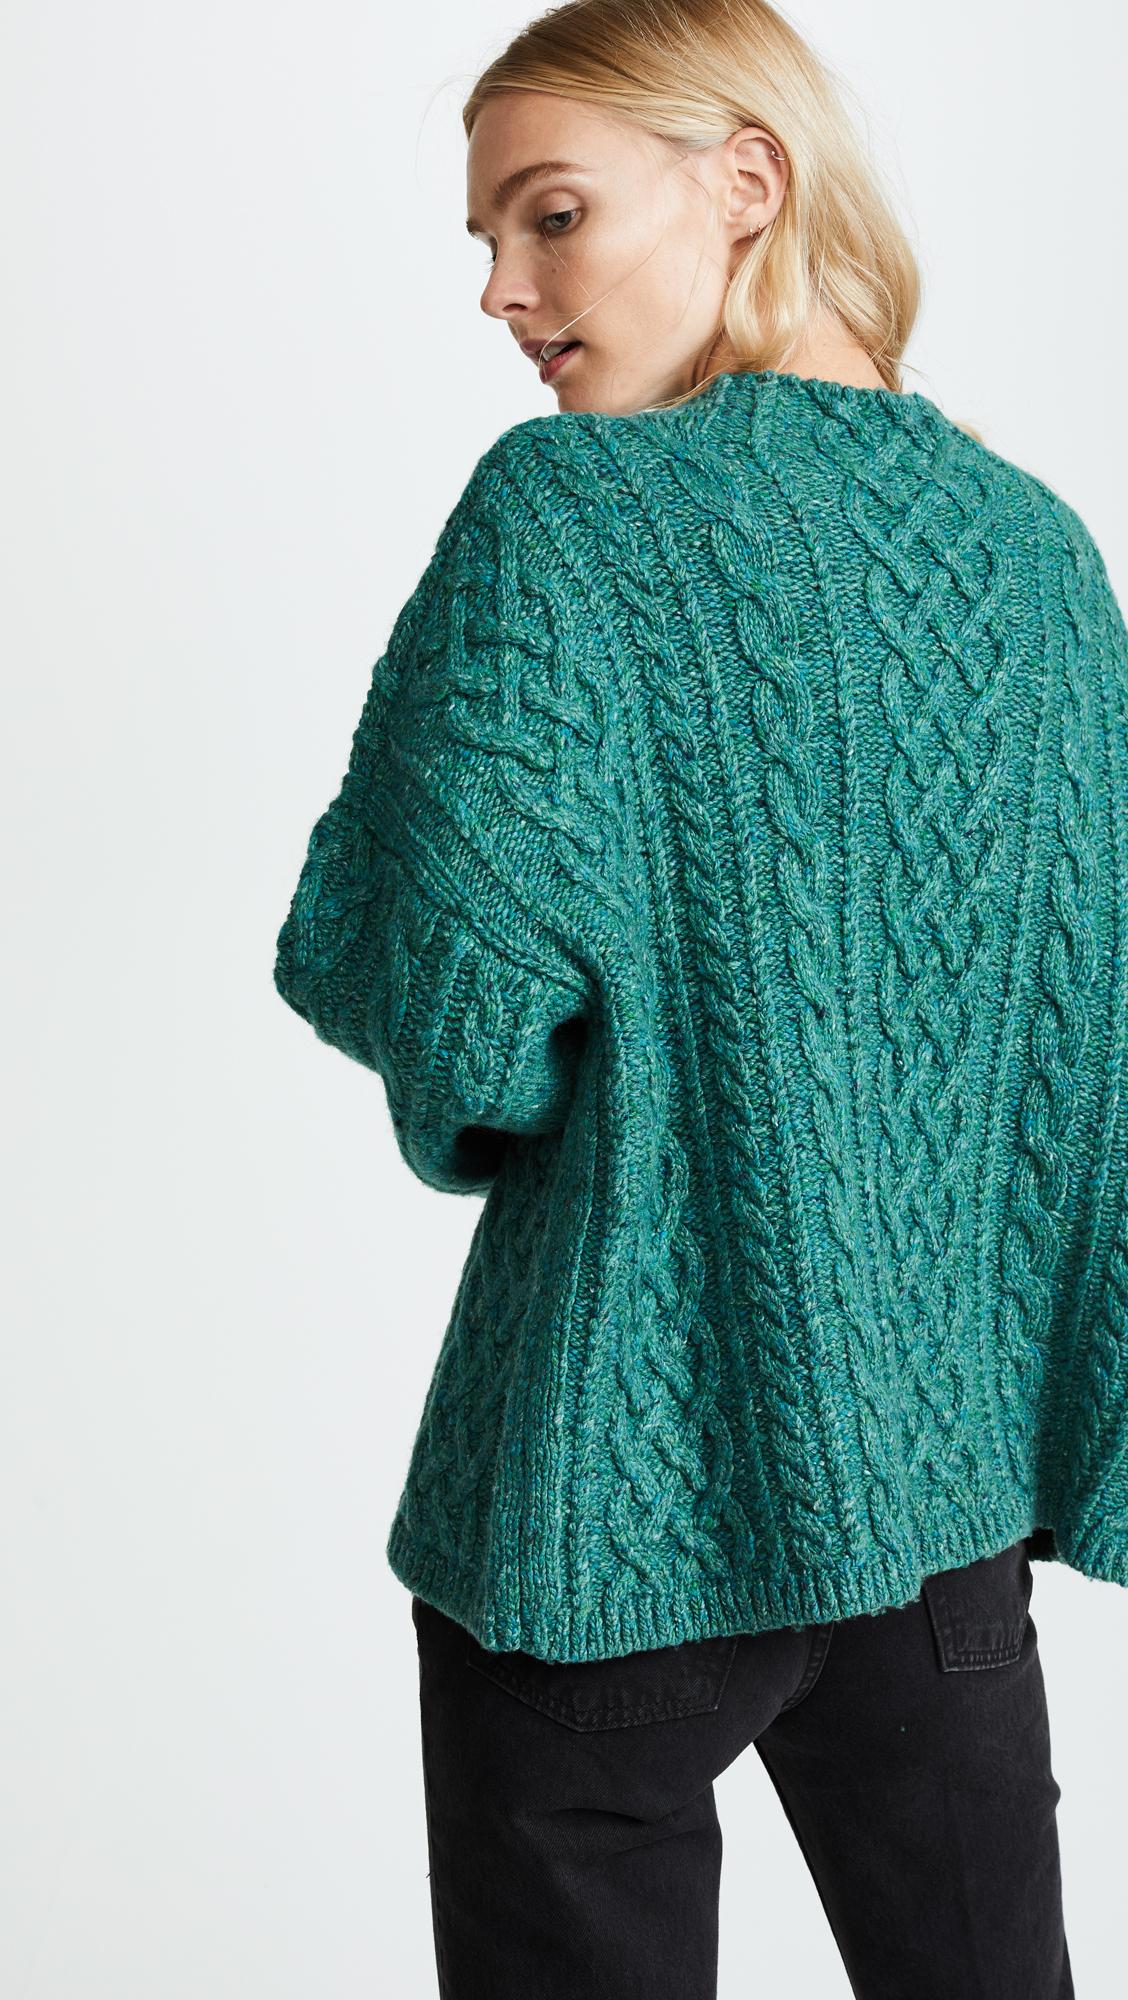 44e93e9bec6e Milly Oversized Fisherman Sweater